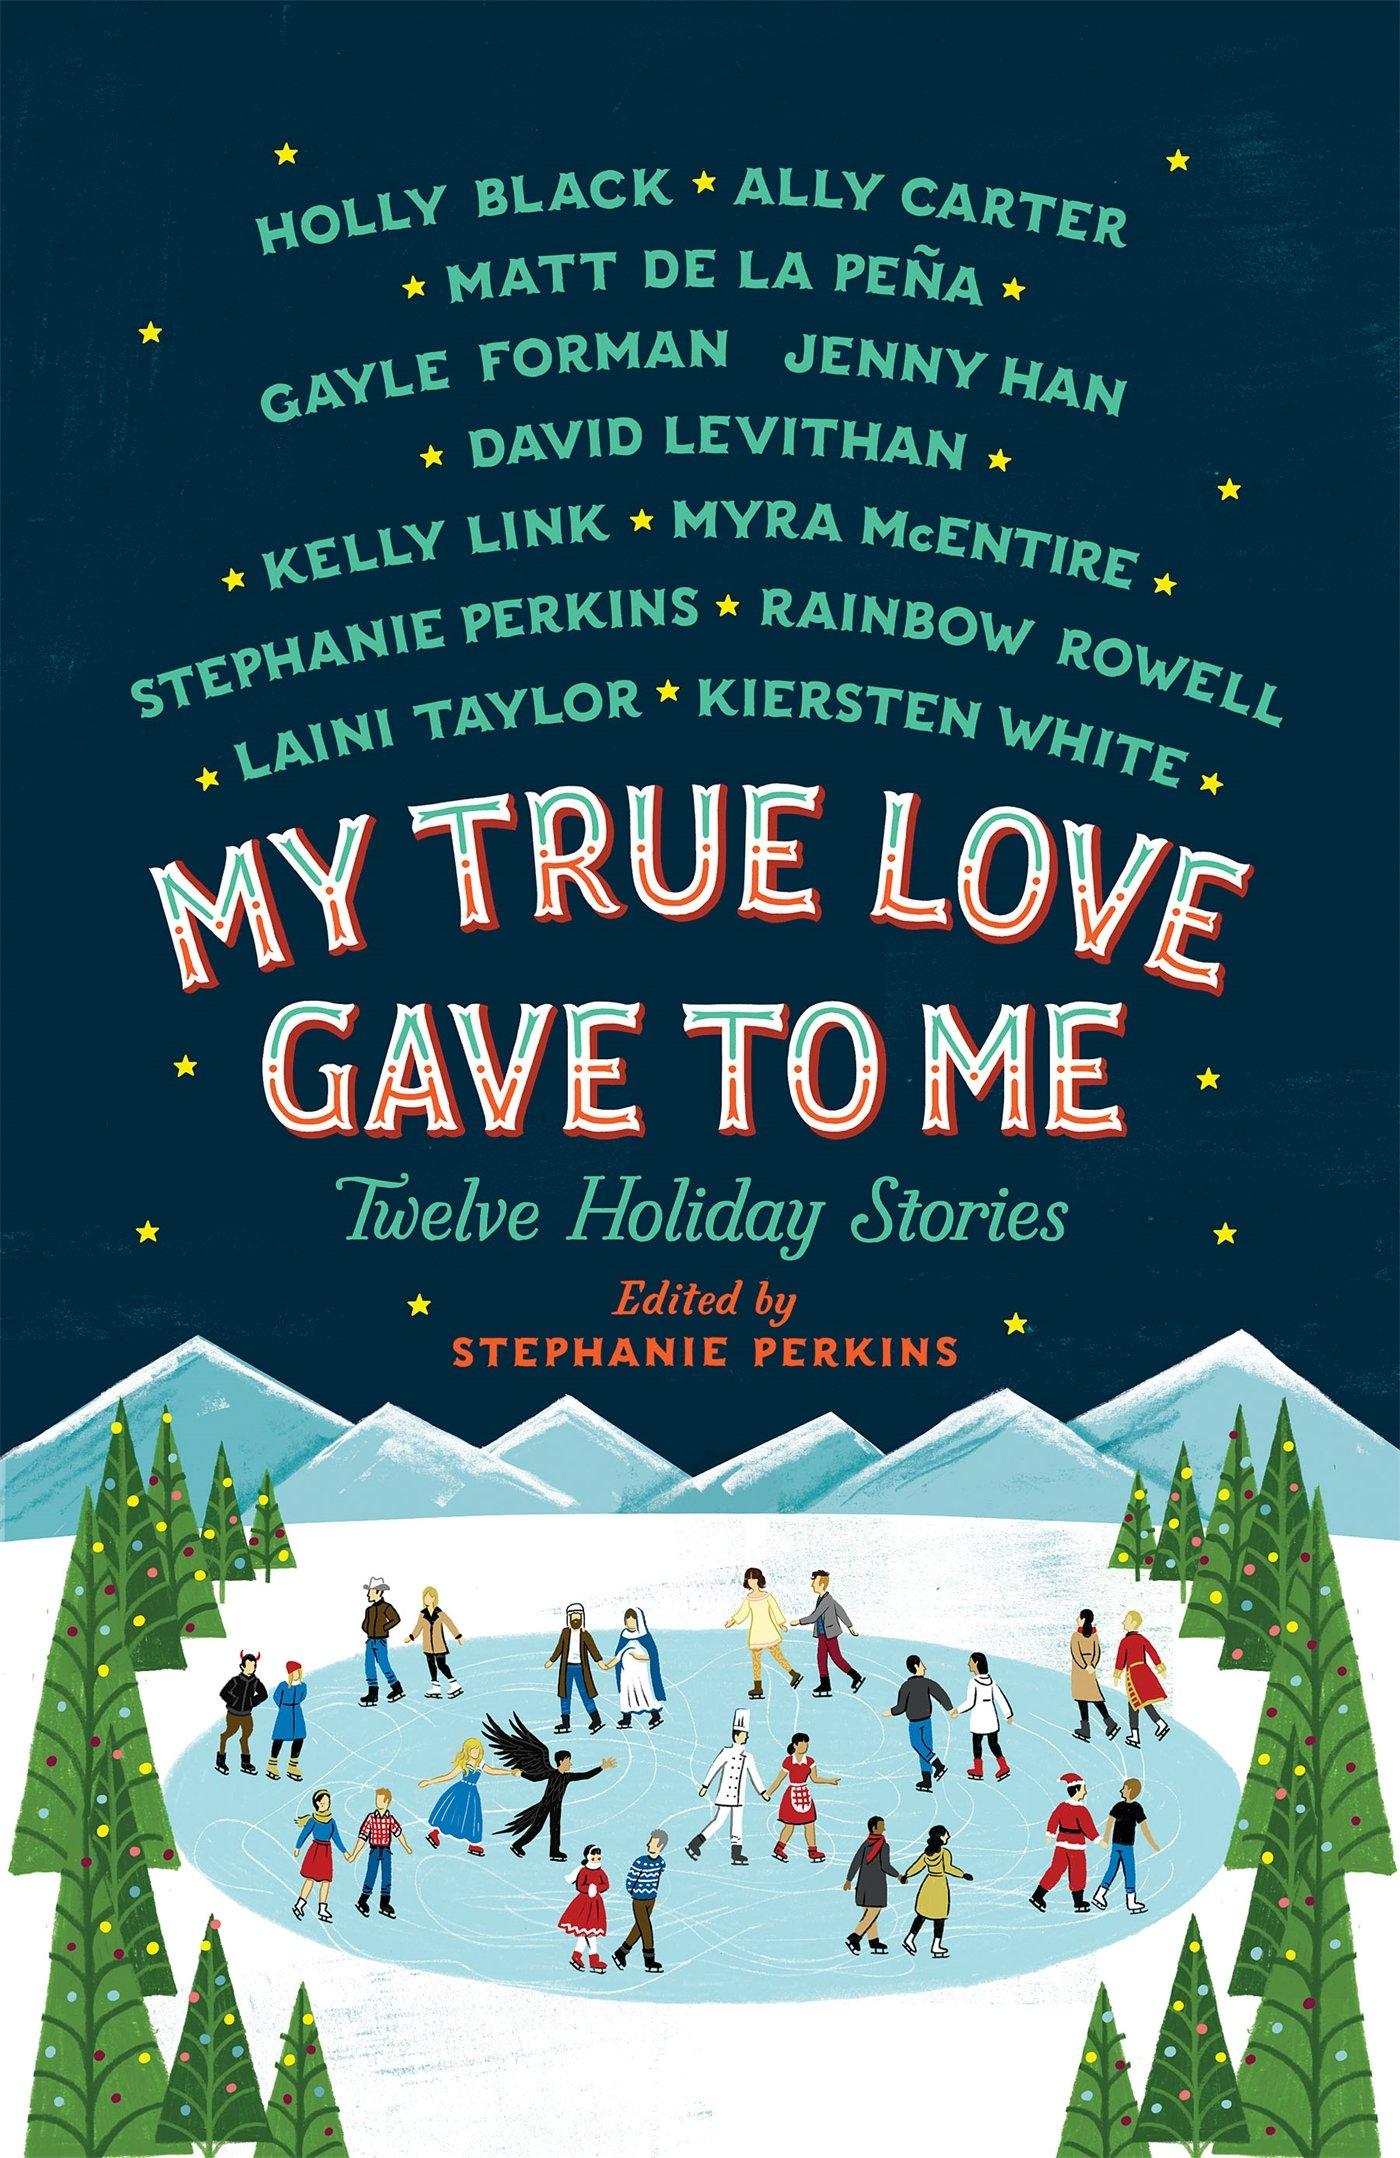 My True Love Gave to Me: Twelve Holiday Stories: Perkins, Stephanie, Black,  Holly, Carter, Ally, de la Pena, Mathew, Forman, Gayle, Han, Jenny,  Levithan, David, Link, Kelly, McEntire, Myra, Rowell, Rainbow, Taylor,